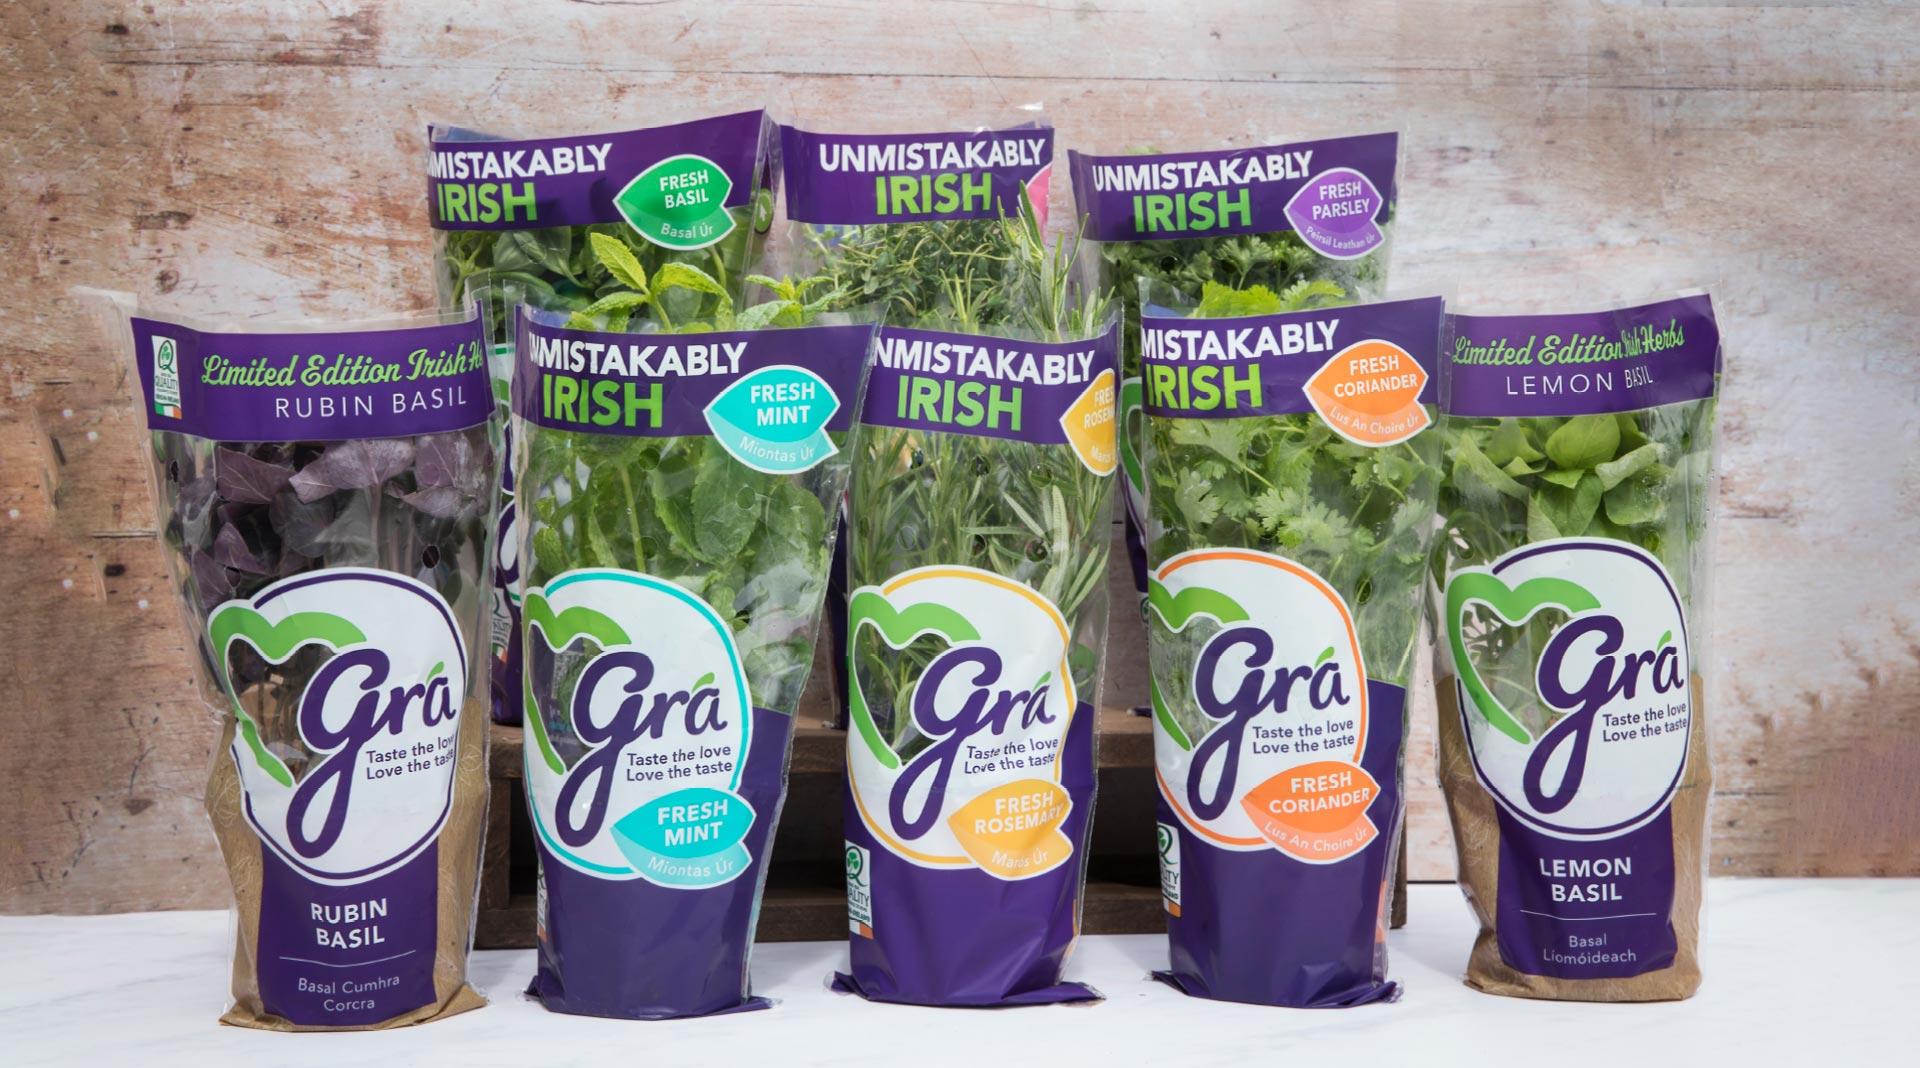 Grá herb range collection designed by Sweet.